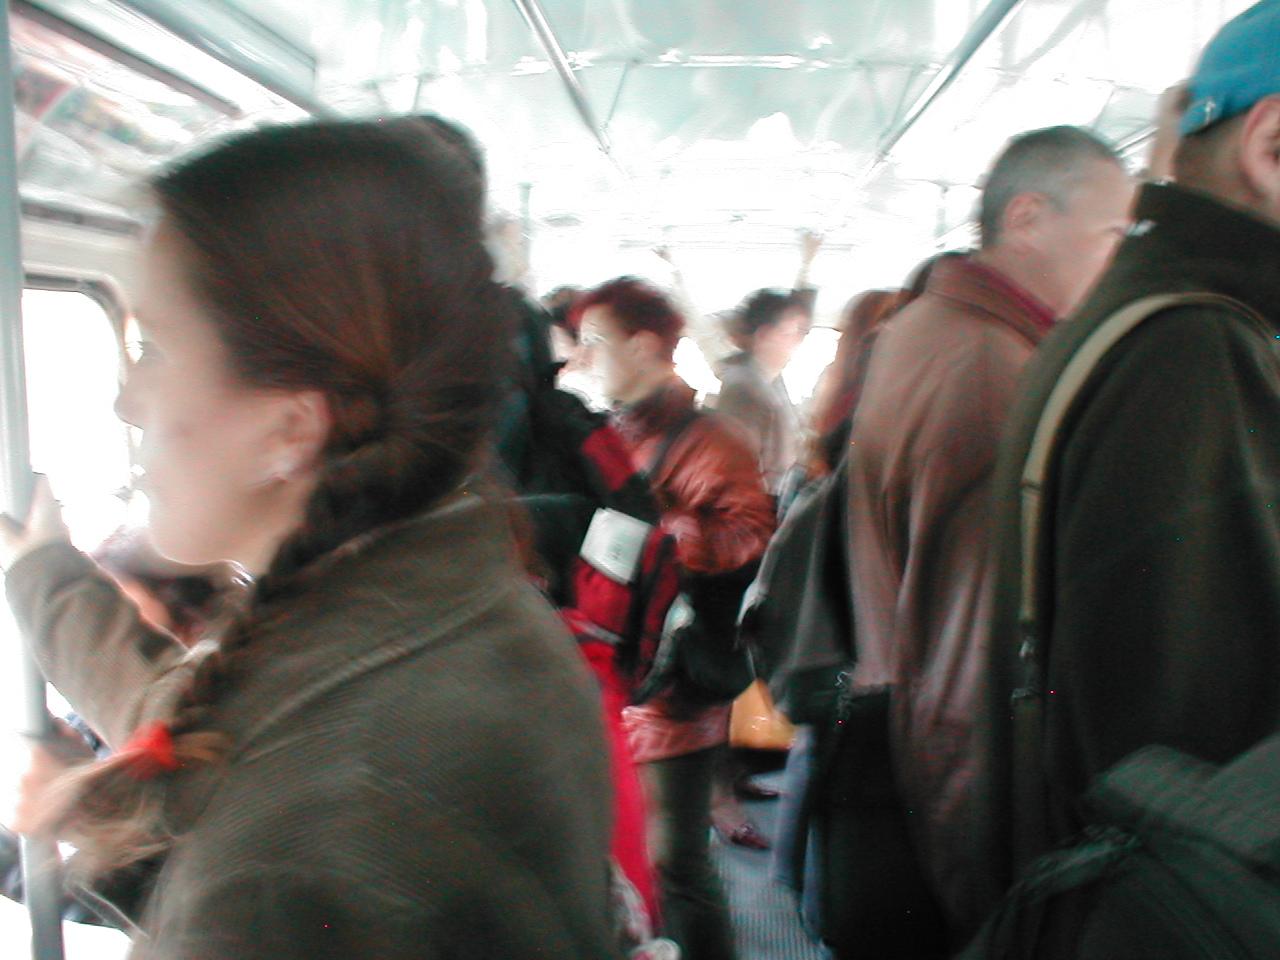 Empörung über Verstaatlichung der Deutschen Bahn | Miesepeters